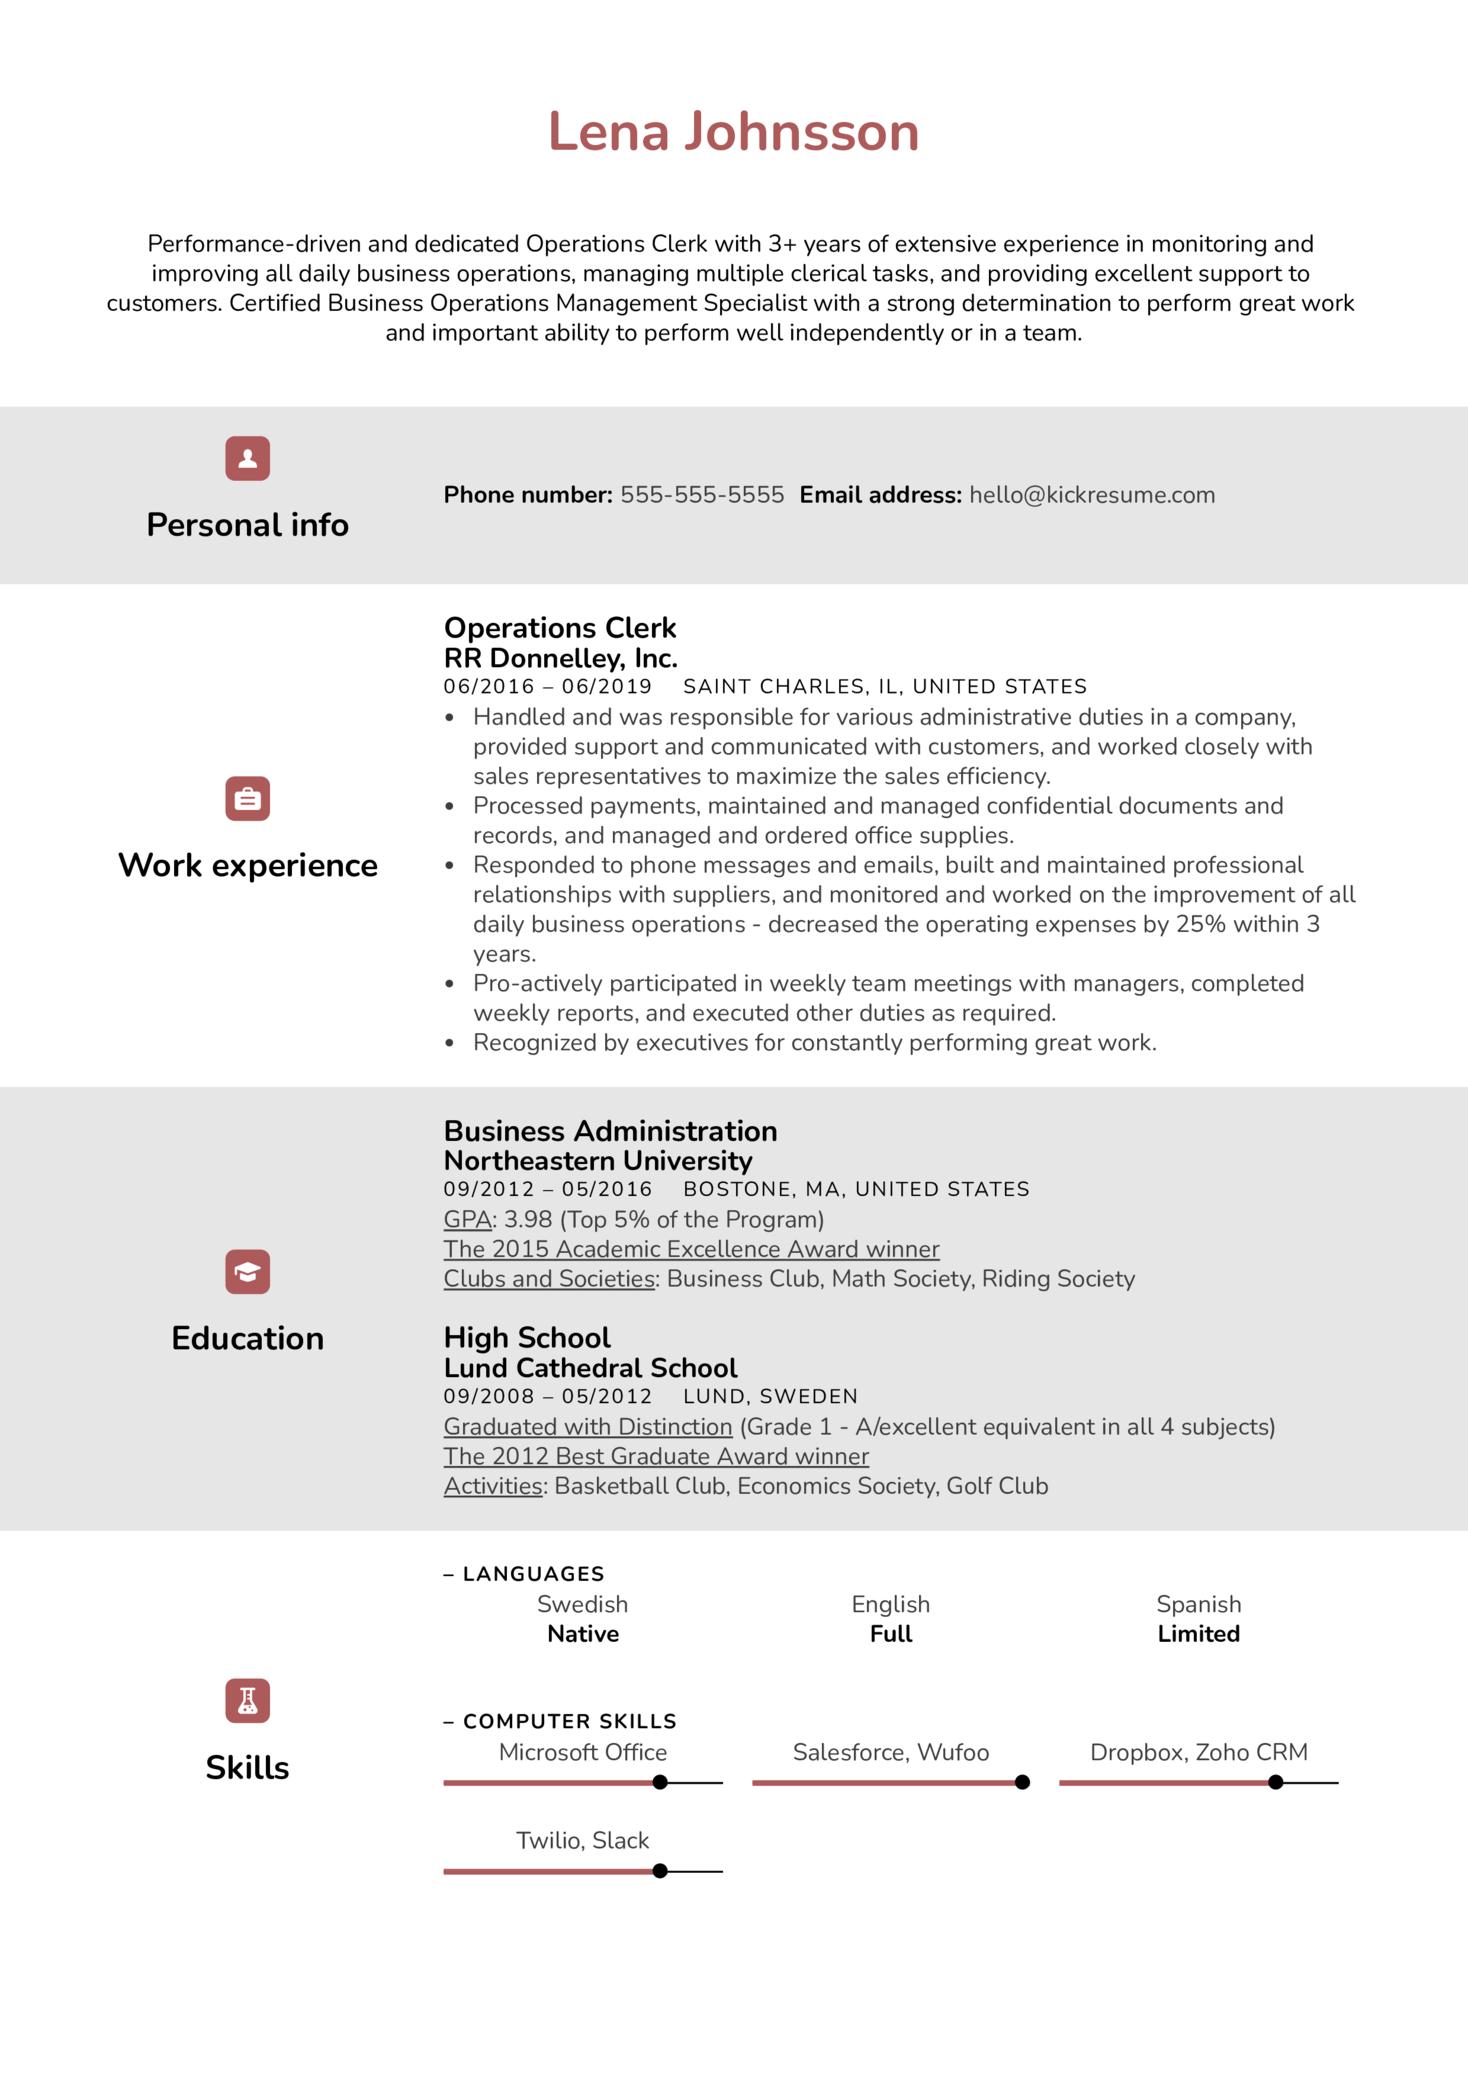 Operations Clerk Resume Sample (Part 1)